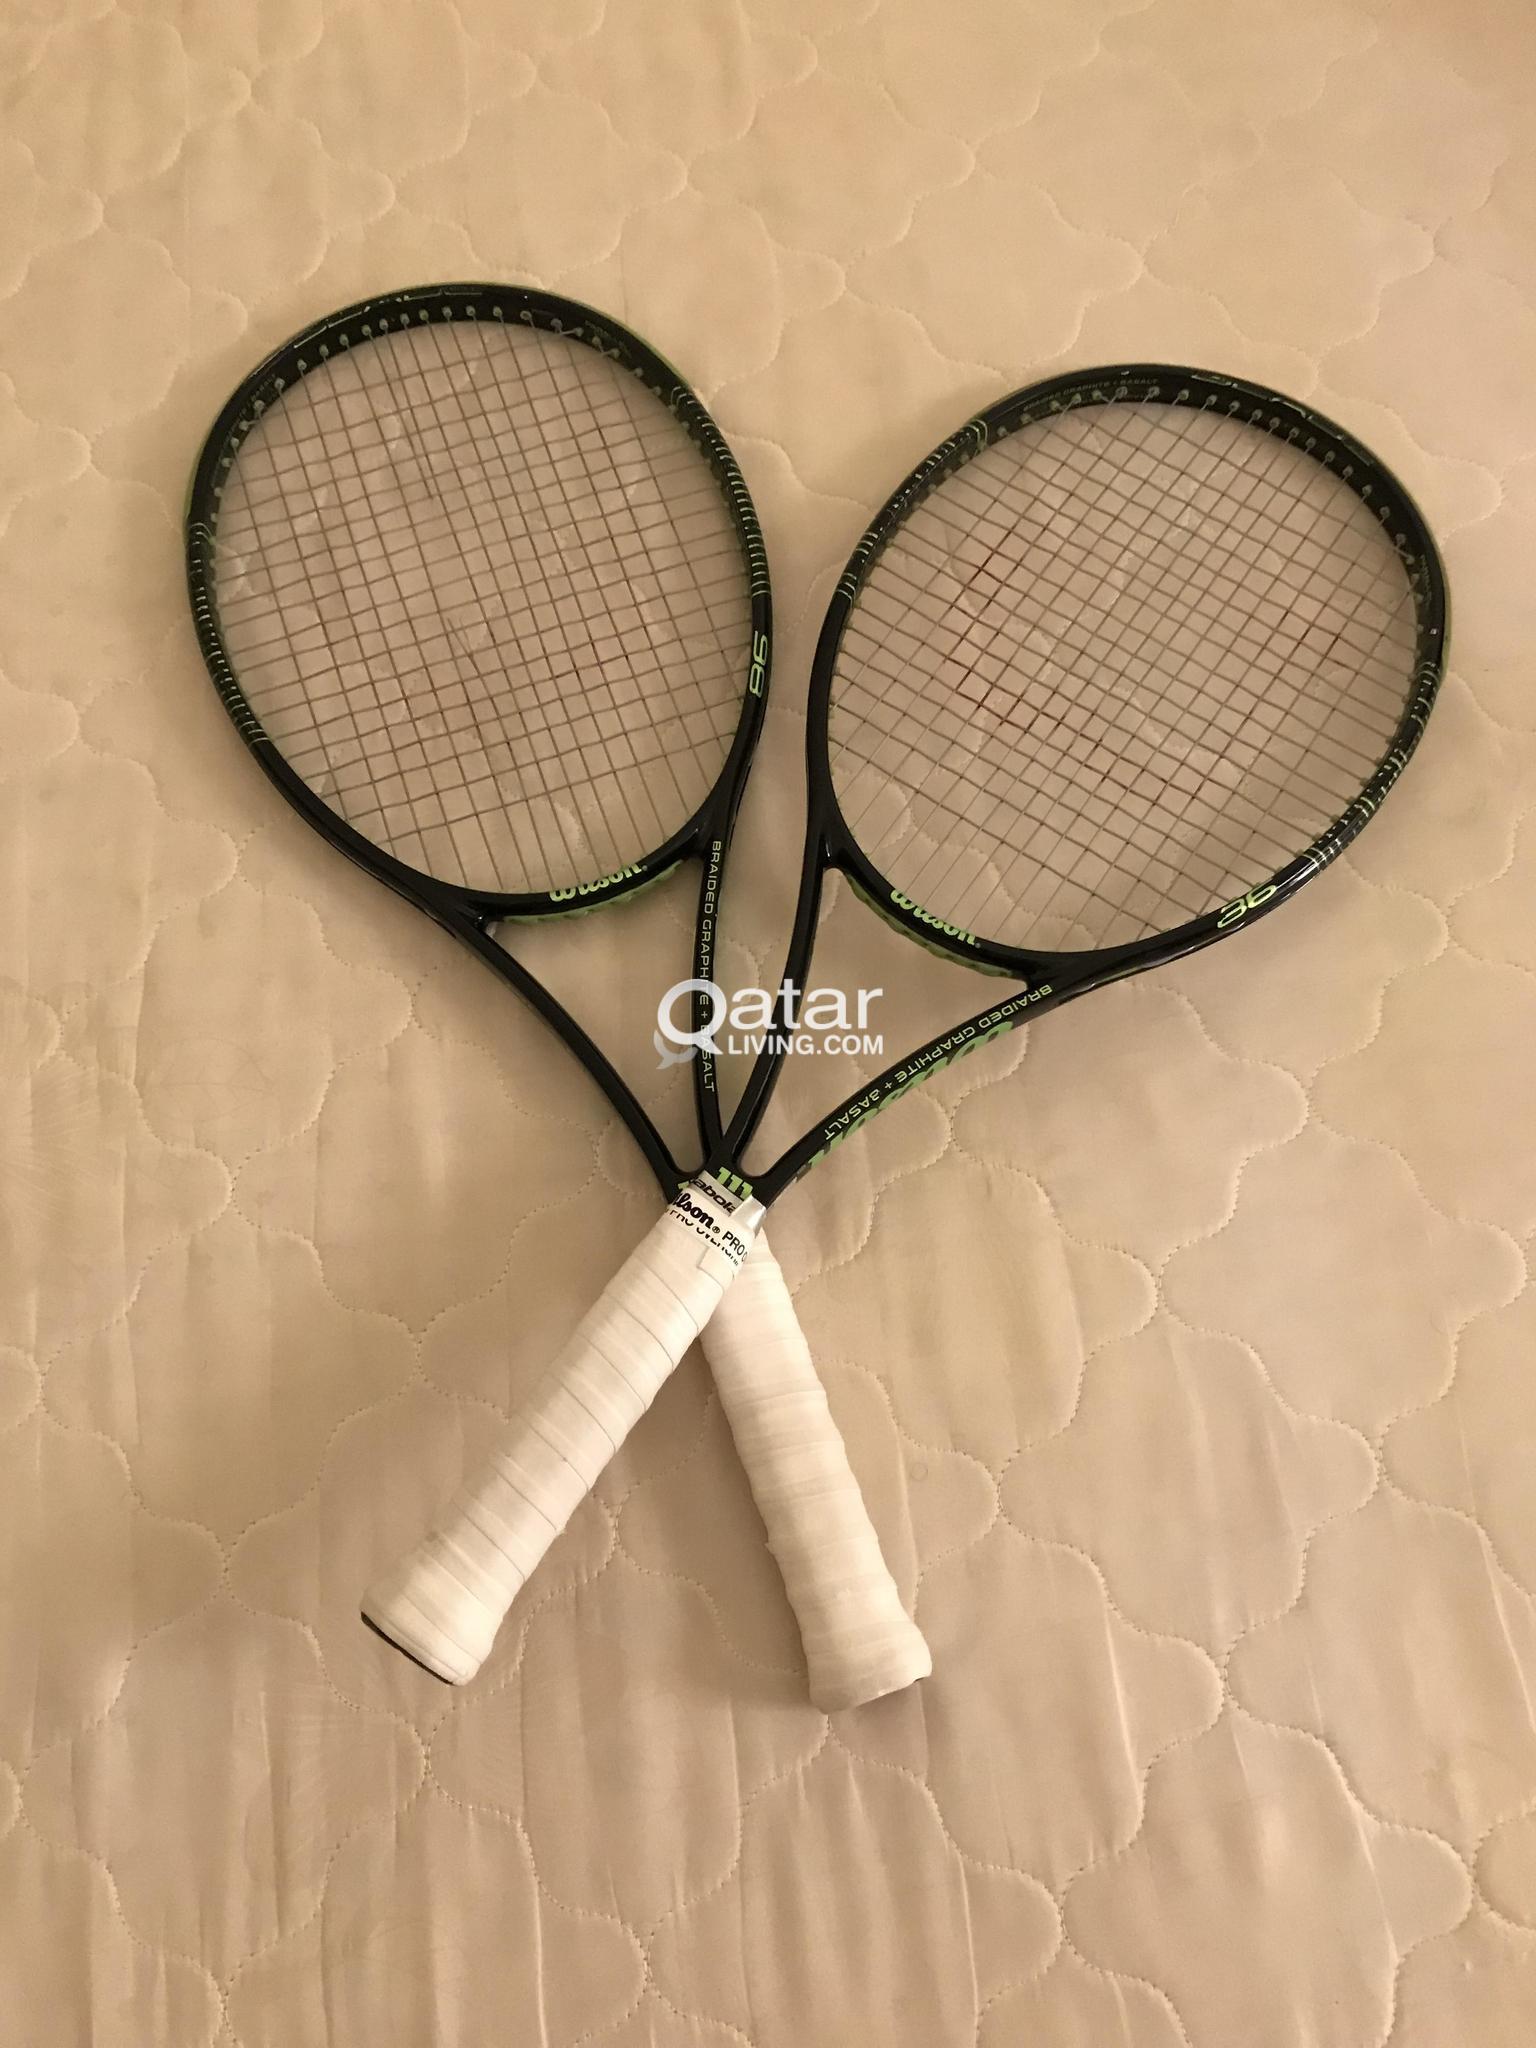 Wilson blade 98 tennis rackets x 2 | Qatar Living